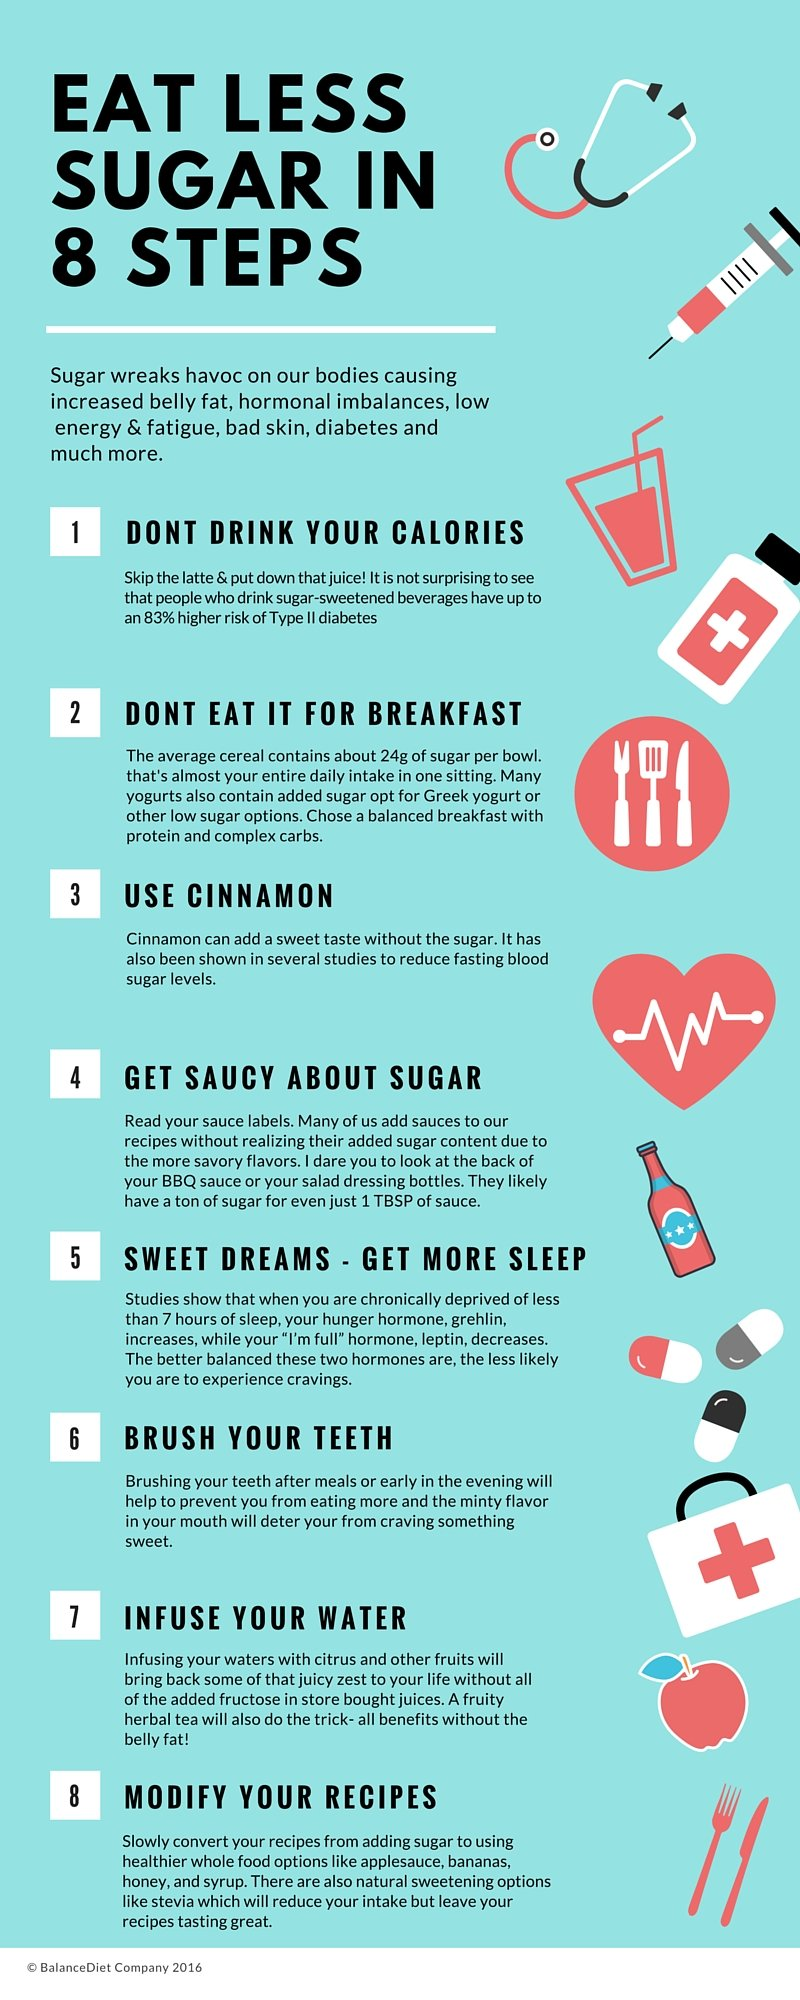 Eat Less Sugar in 8 Steps